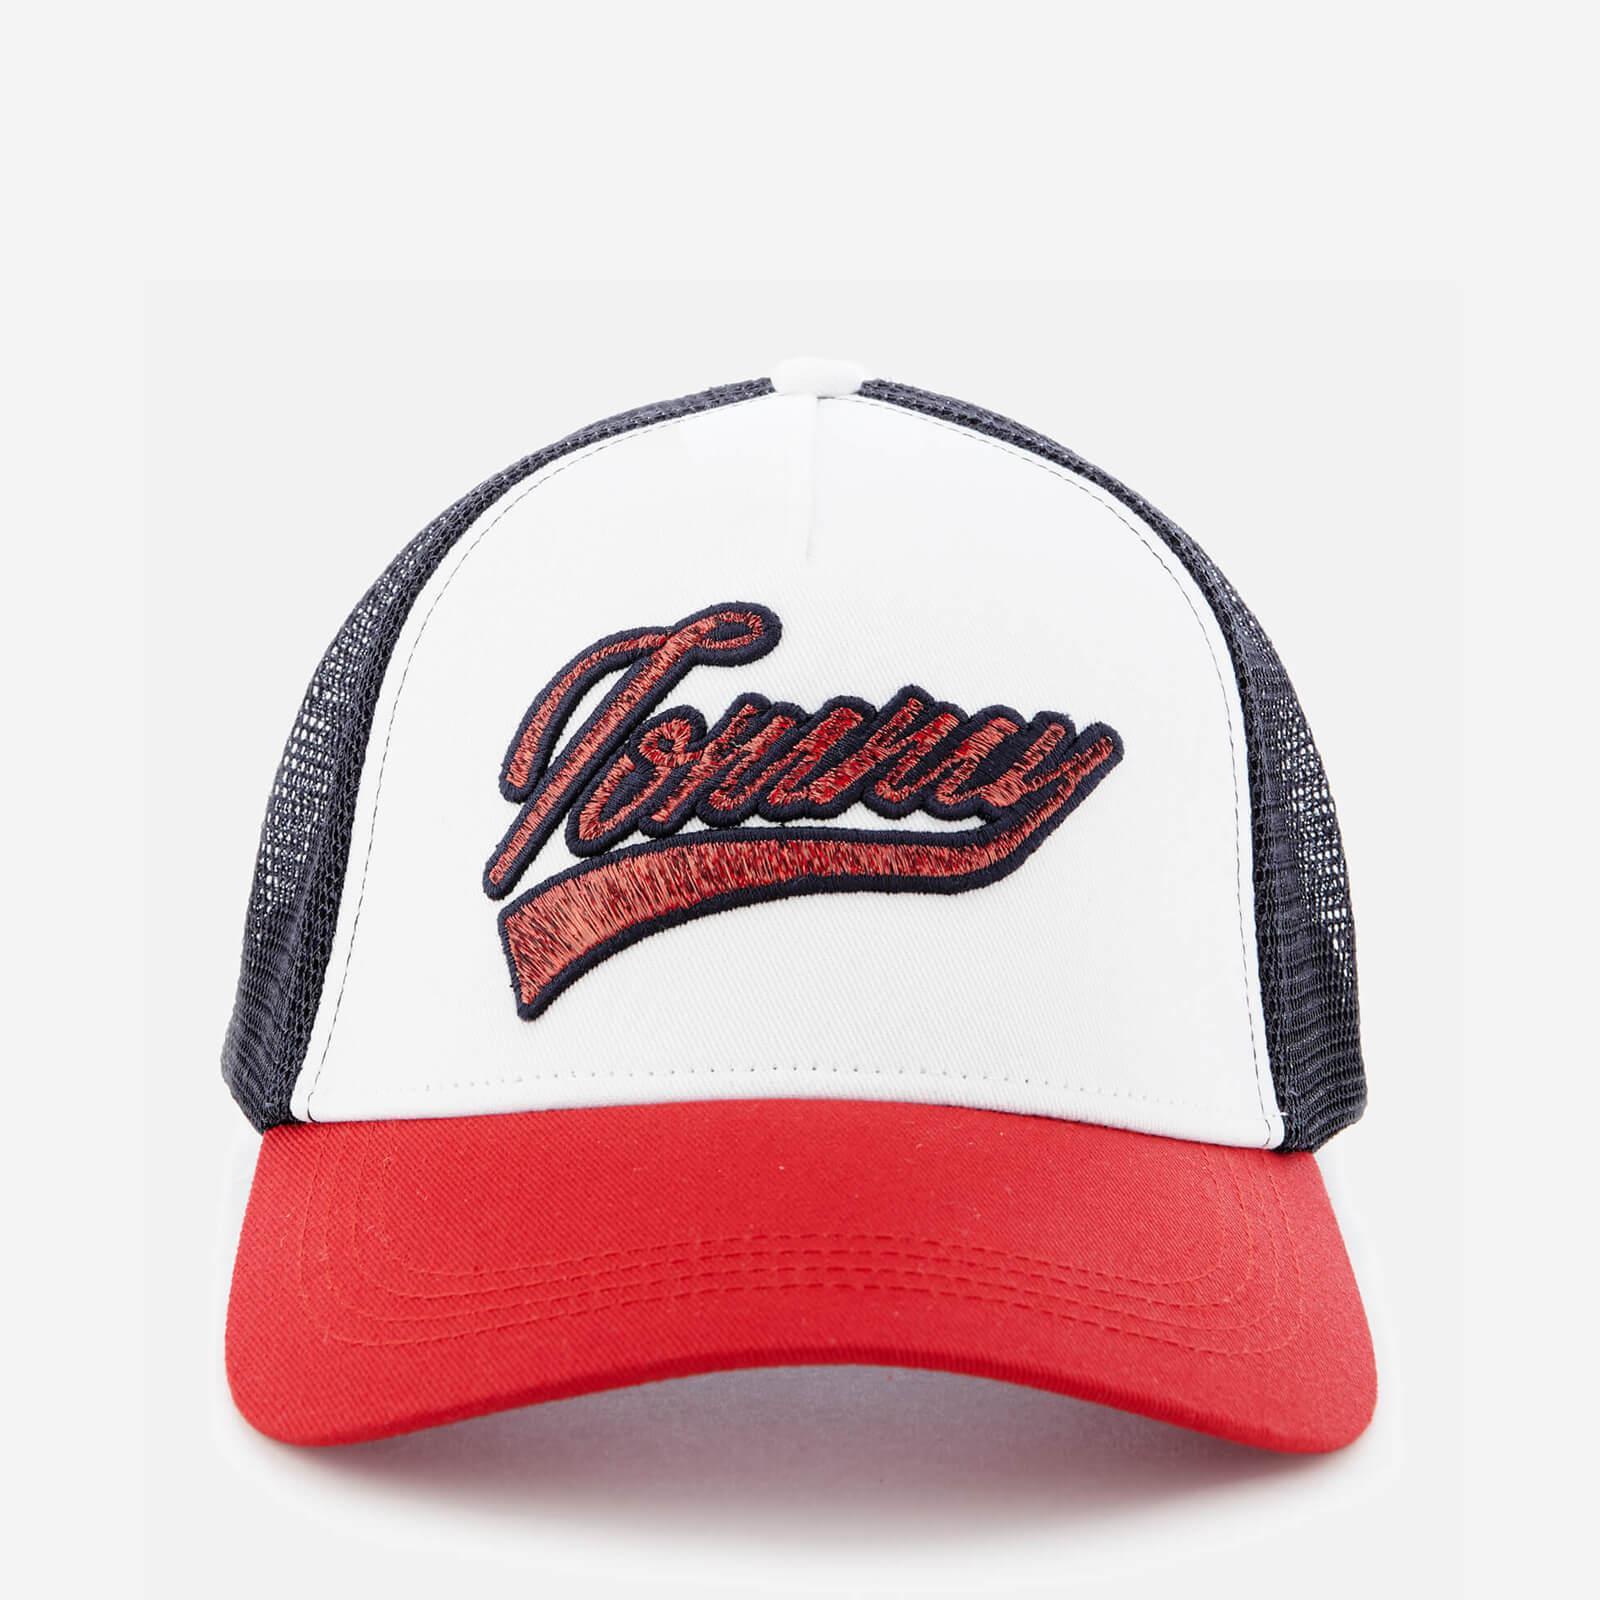 12398c5686 Tommy Hilfiger Urban Cap in Red - Lyst